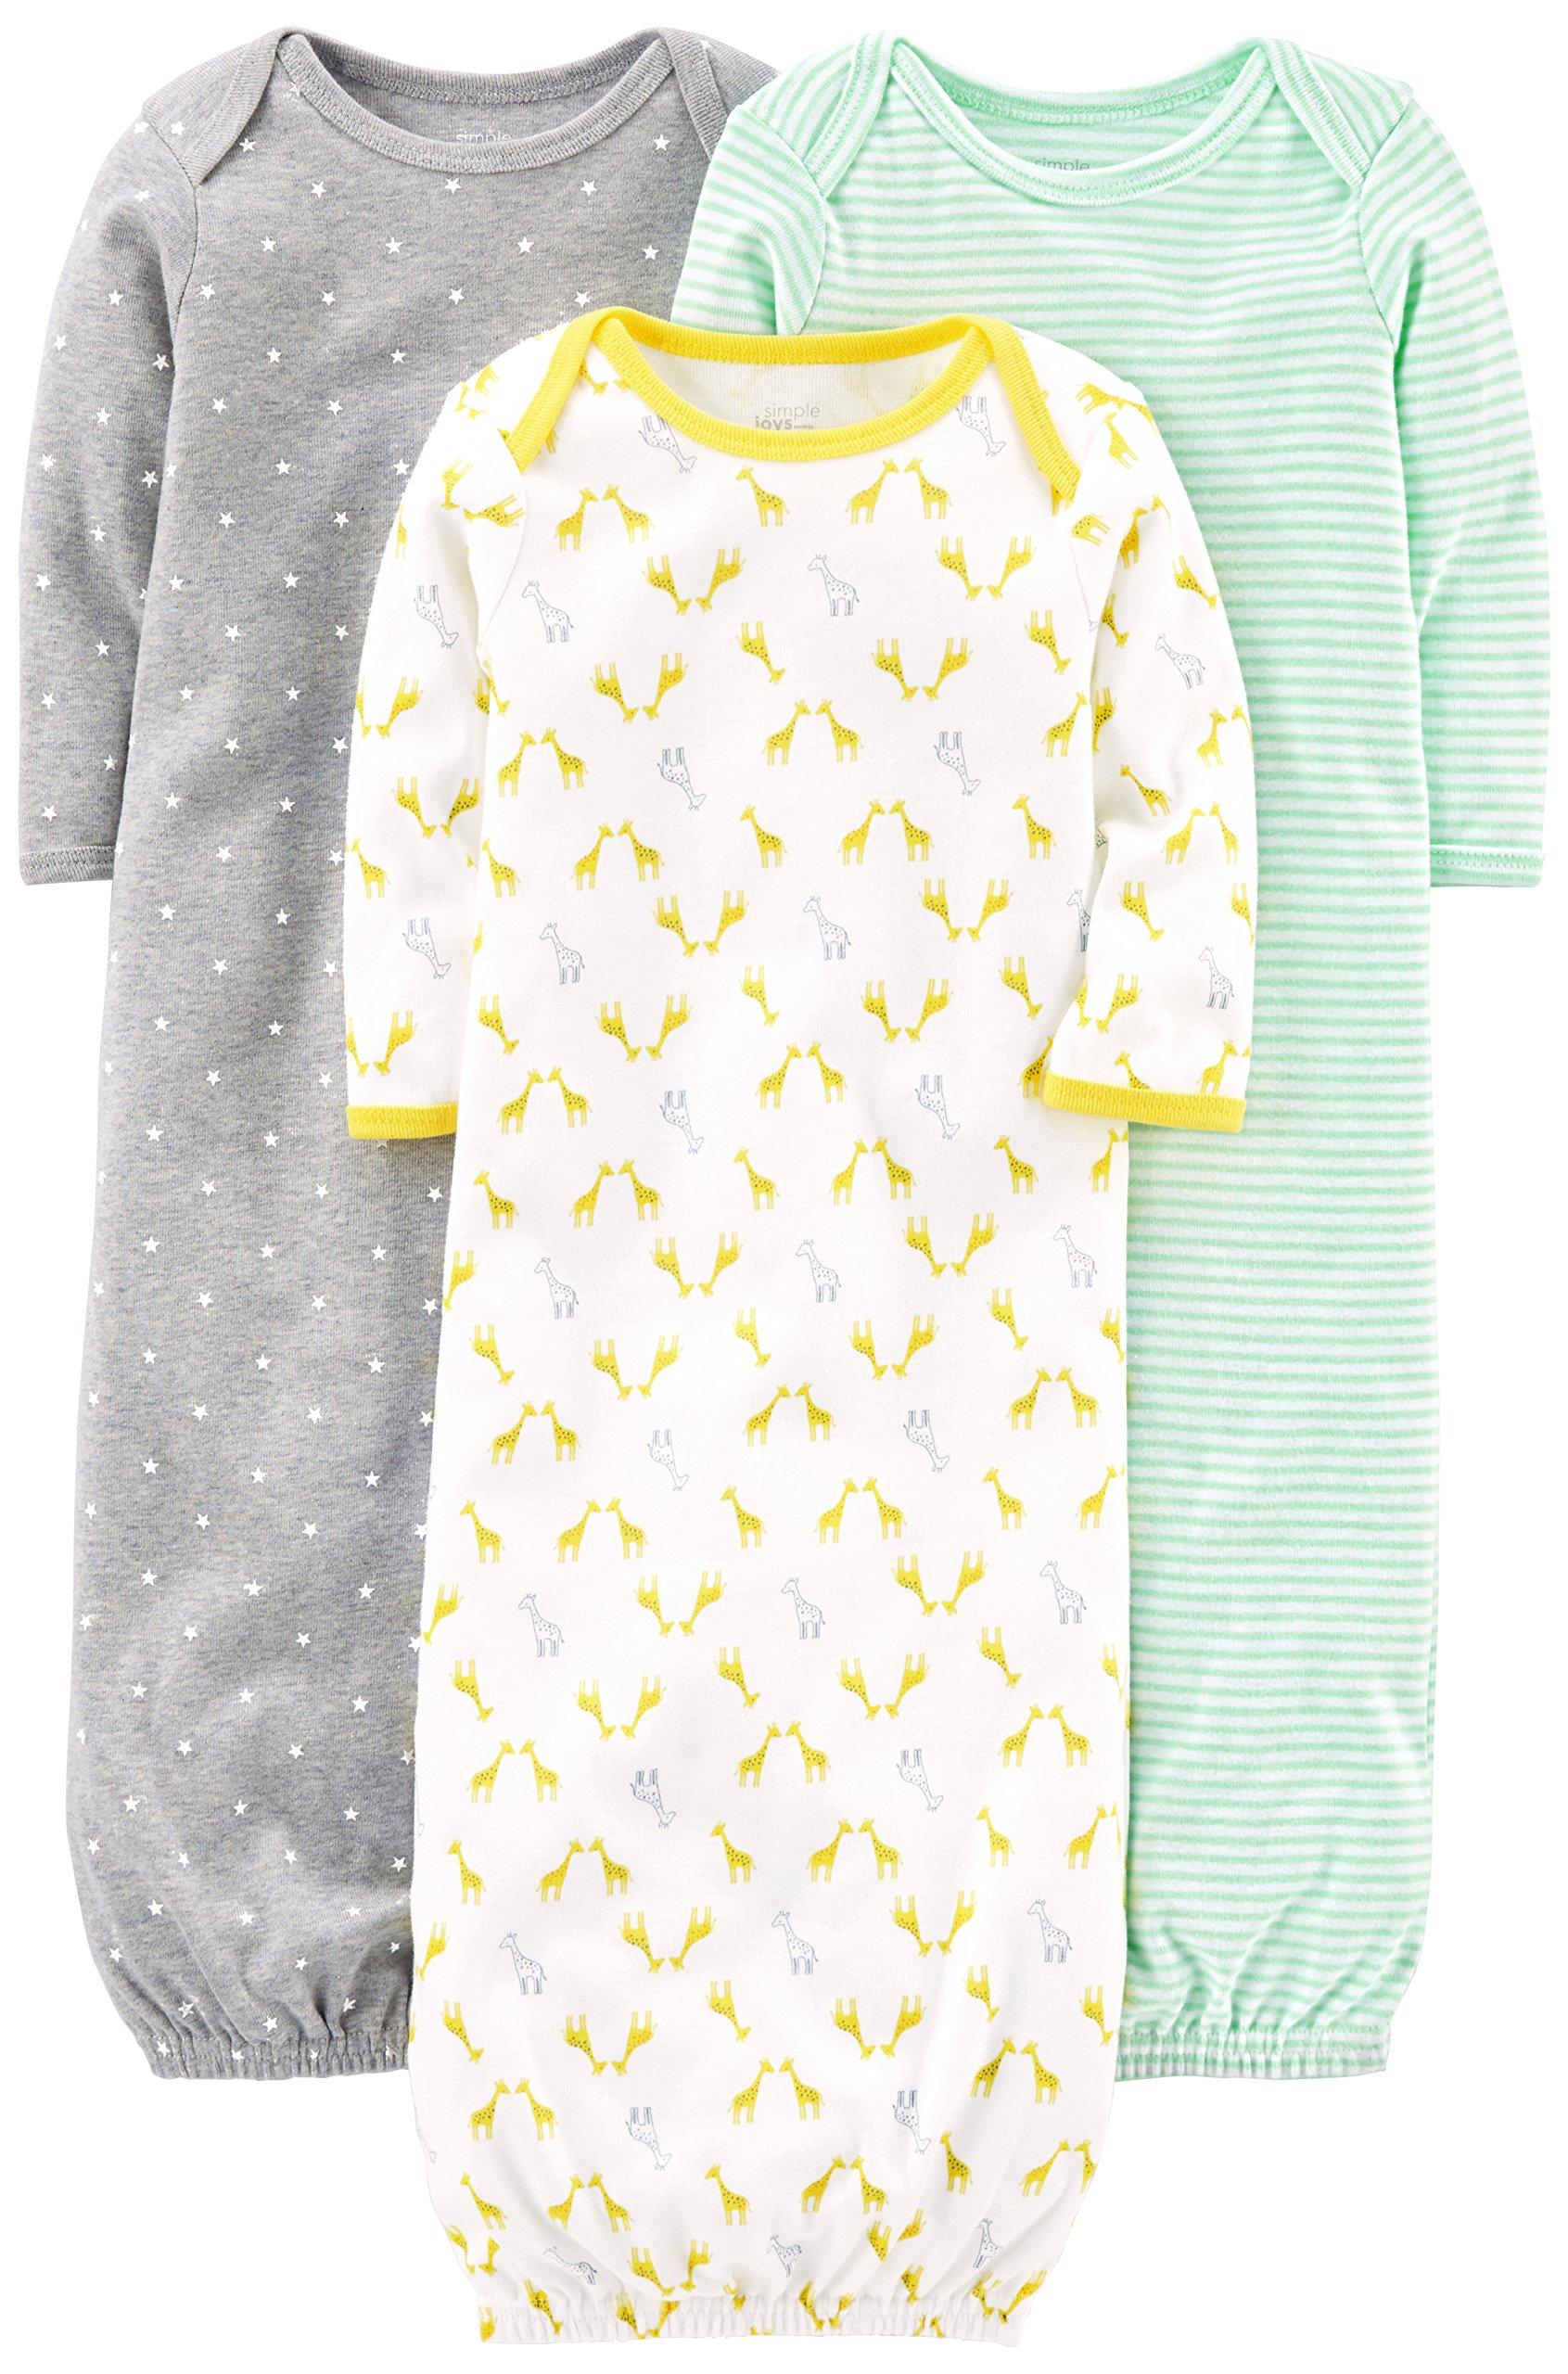 Best sleeper gowns for newborn | Amazon.com